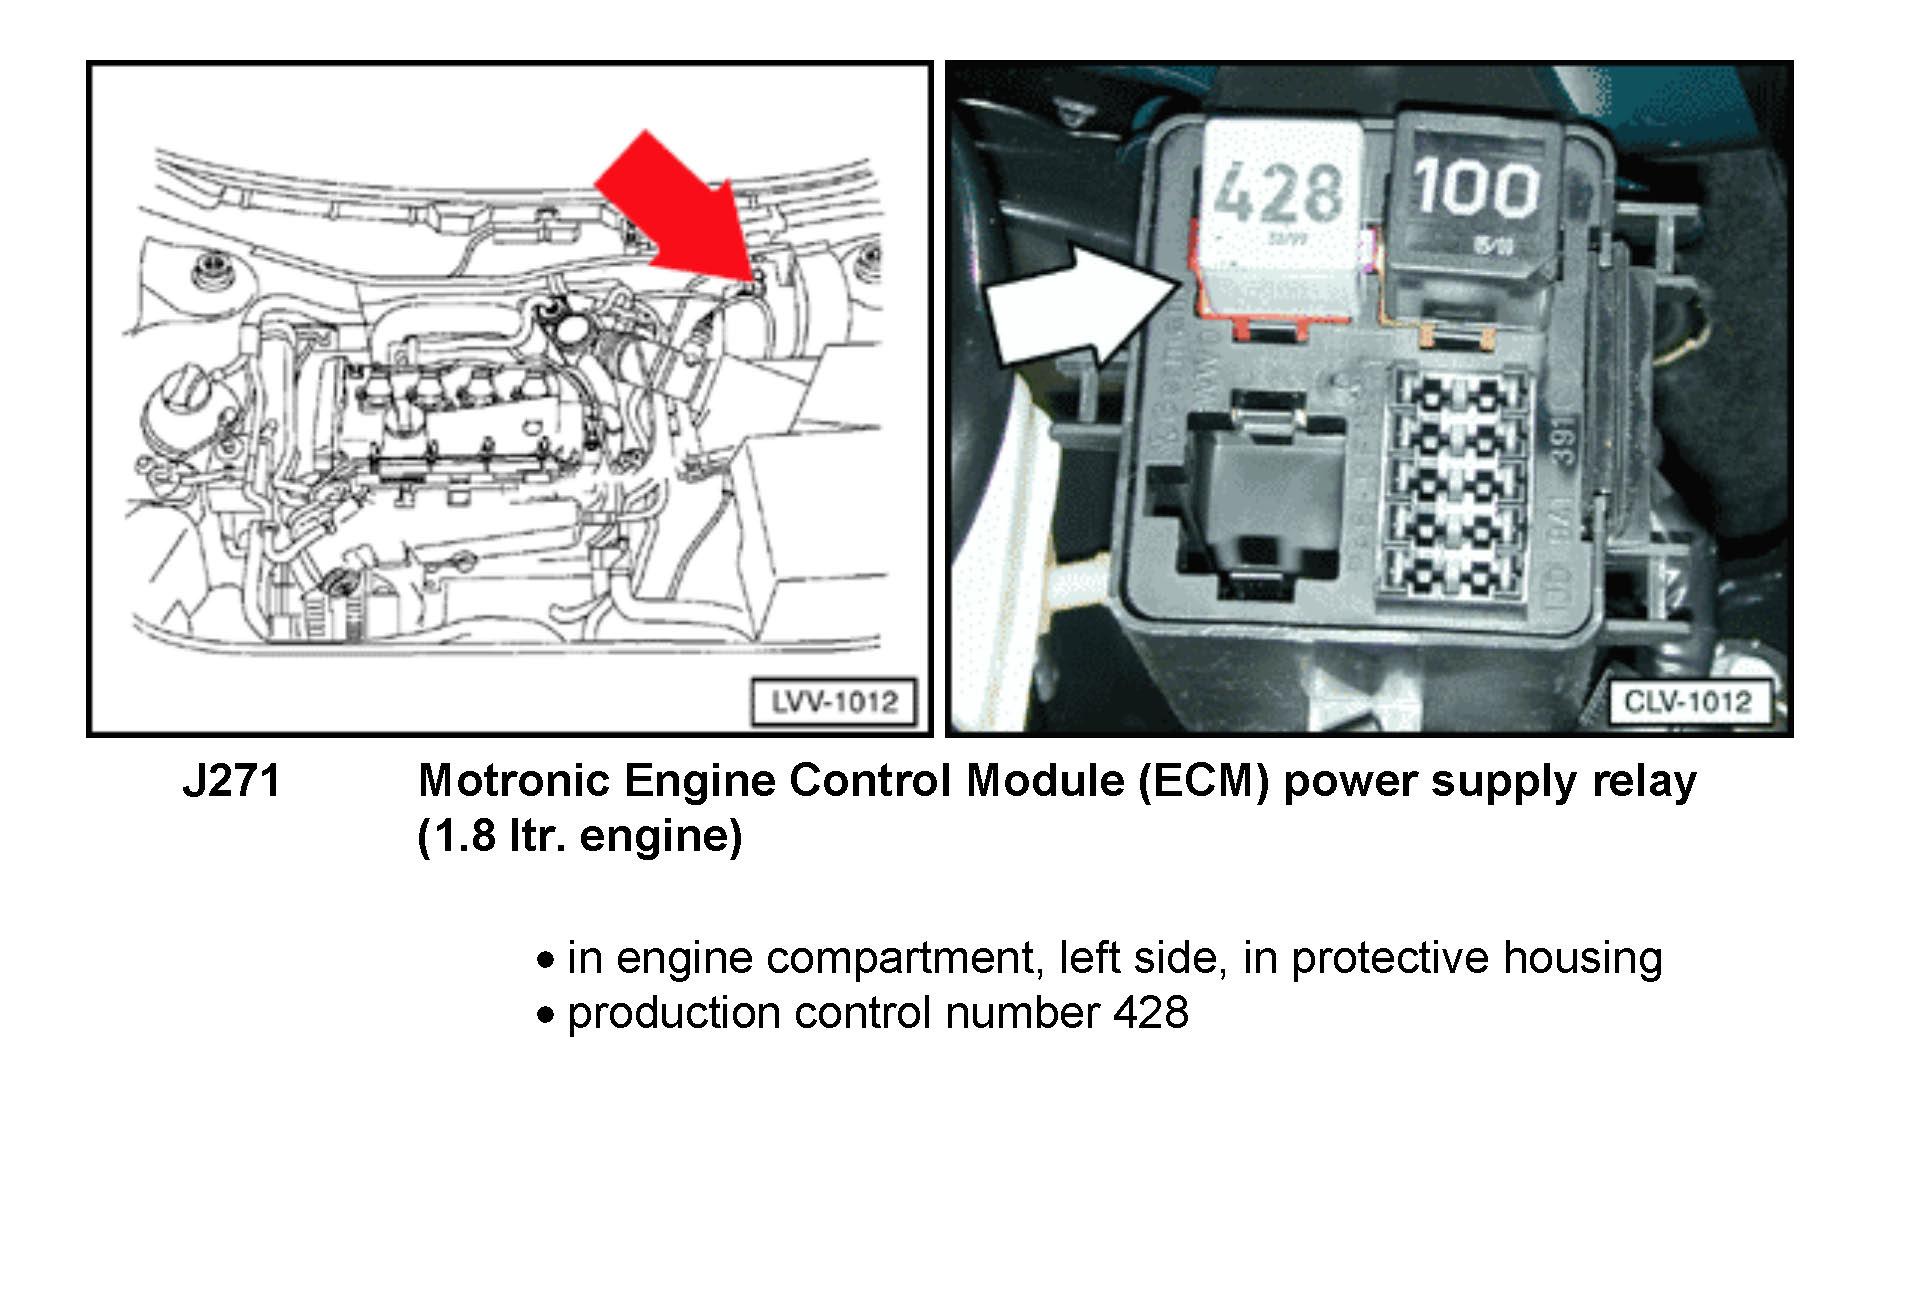 2005 vw jetta fuel pump relay location image details  2005 vw jetta fuel pump relay location